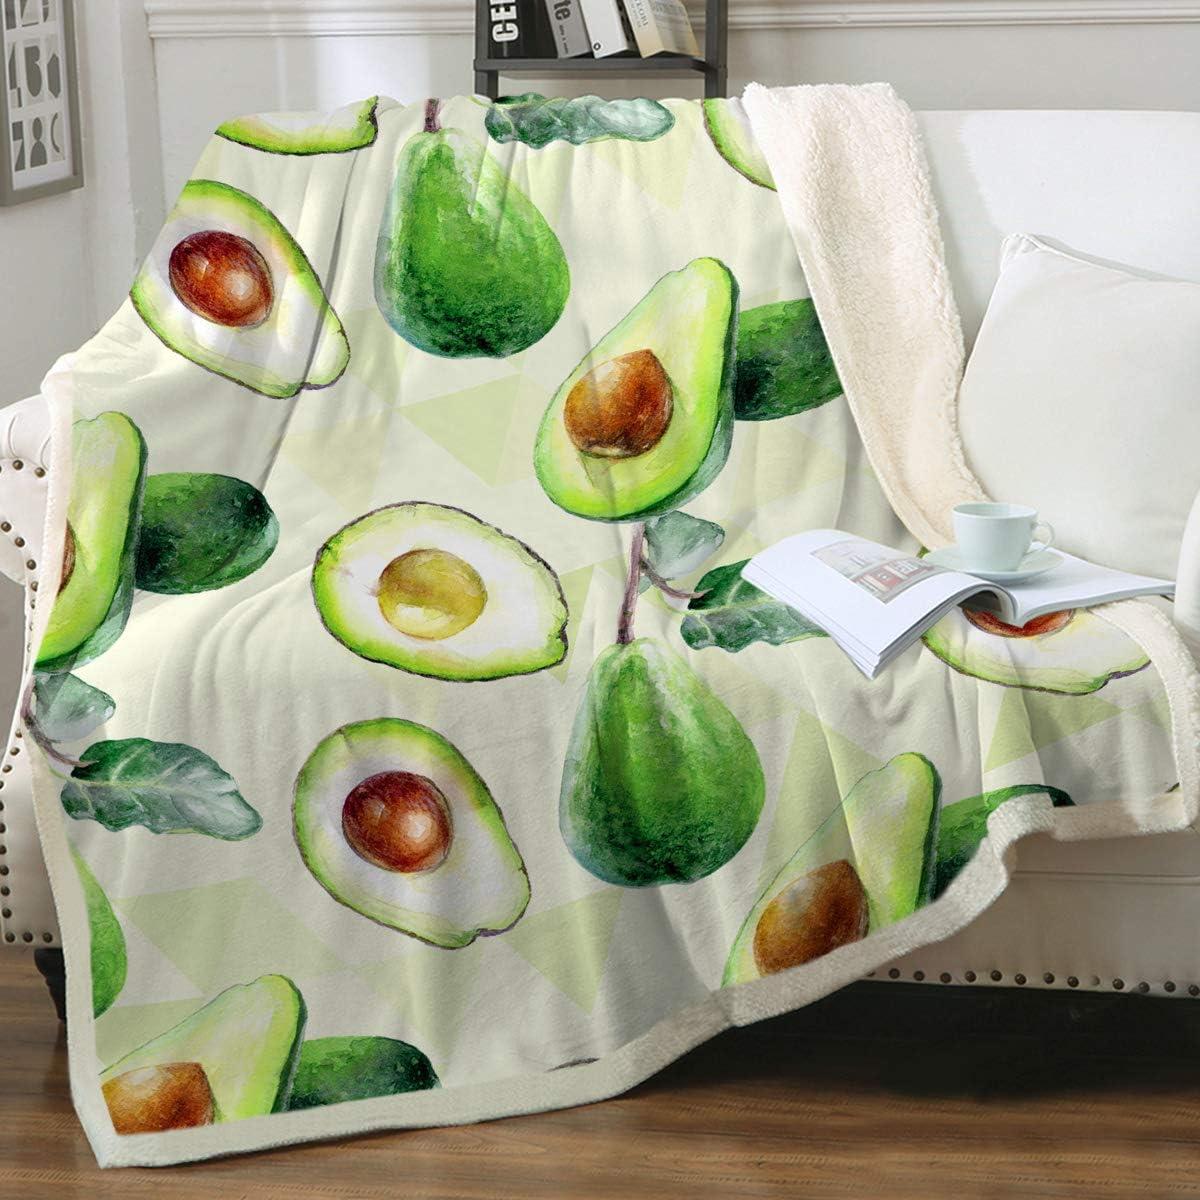 Sleepwish Sherpa Fleece Blanket Fruit Cute Print Avocado Mail Sales of SALE items from new works order